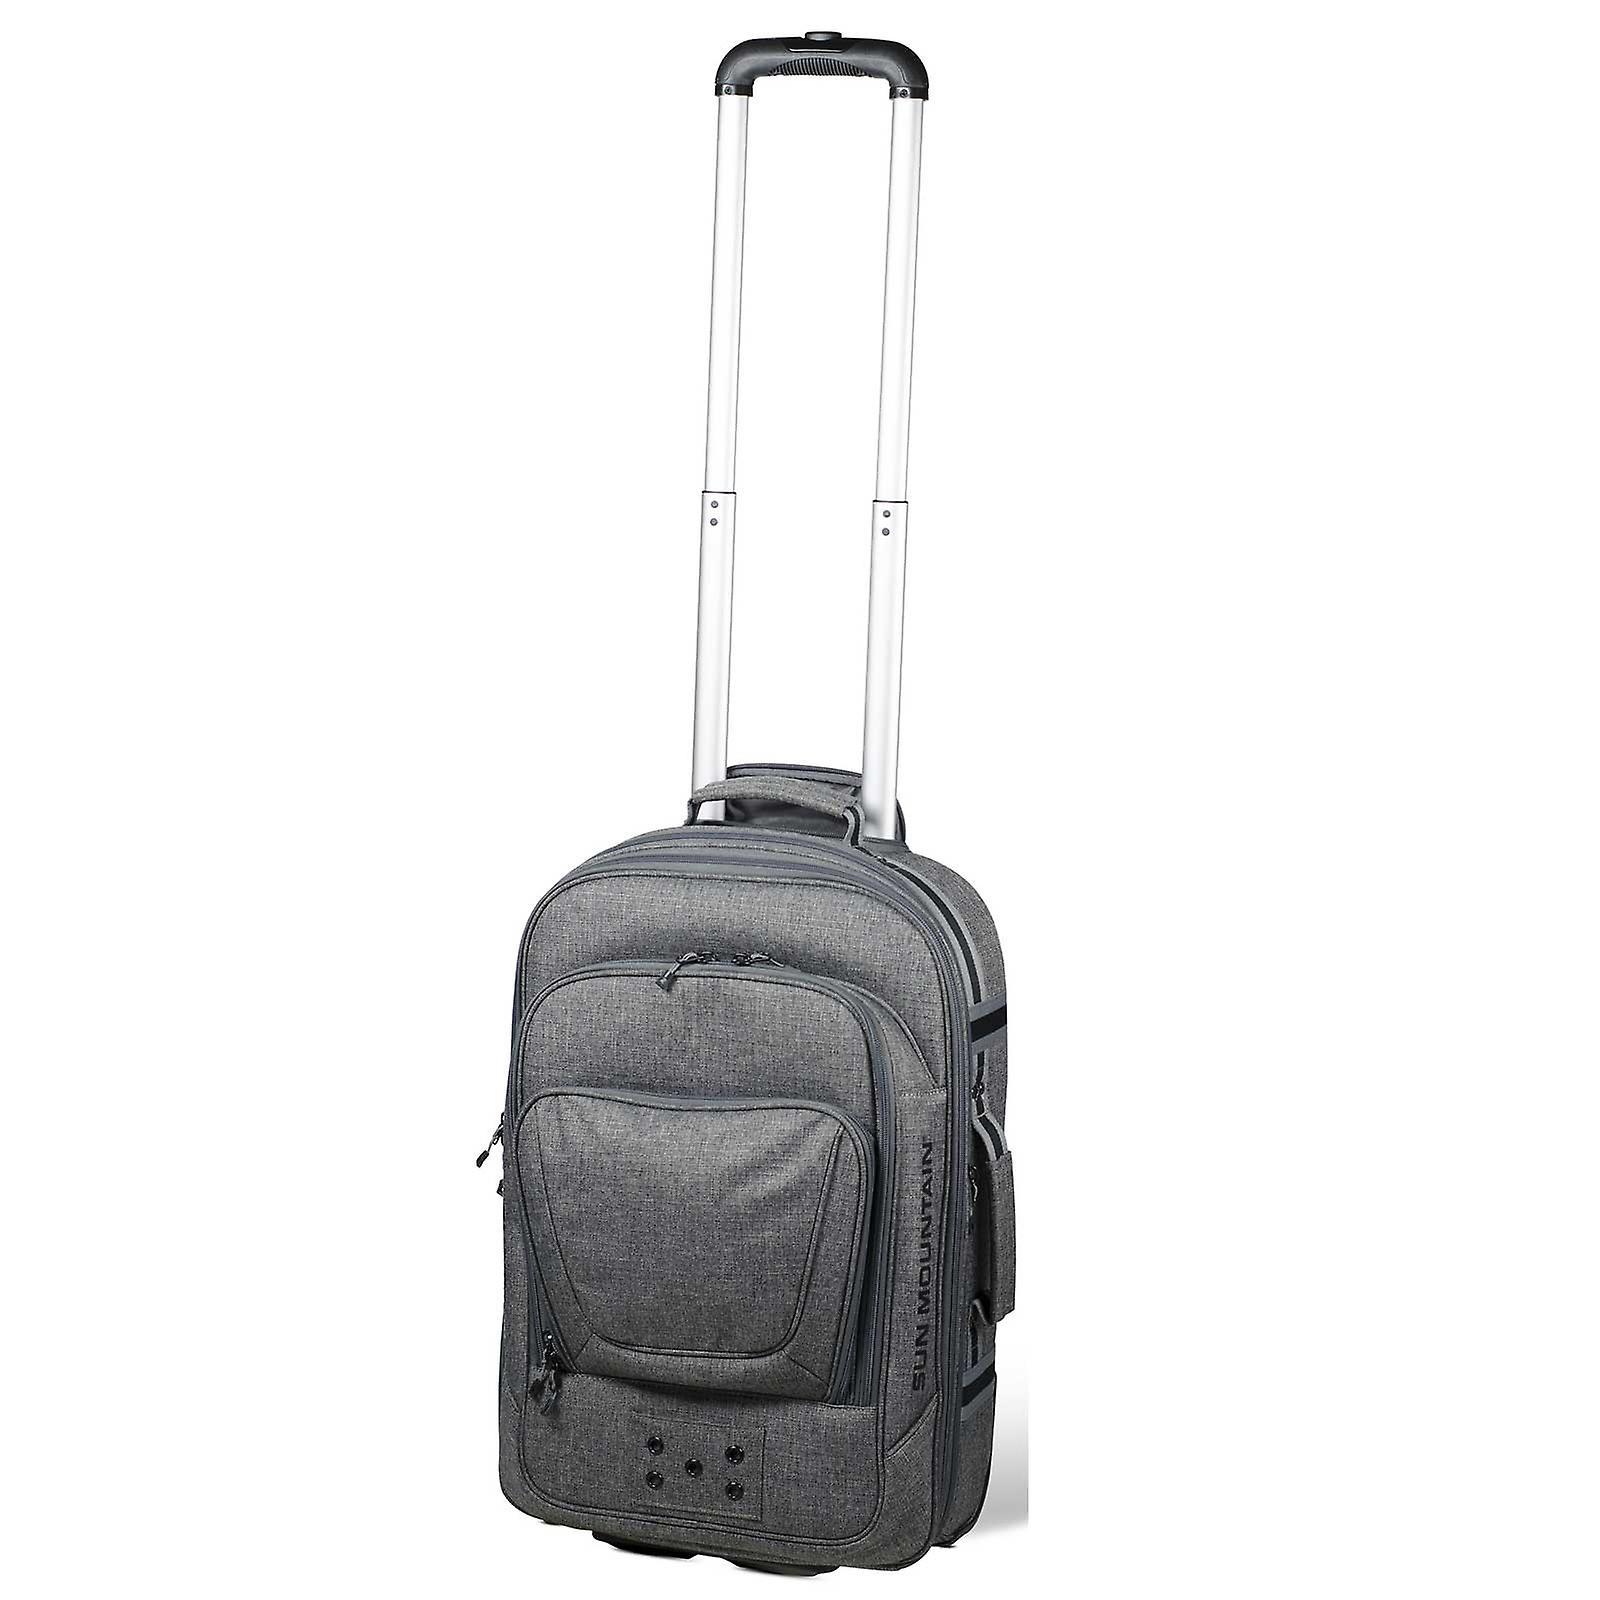 Sun Mountain hjul carry on flygning resa bagage väska Iton Grey